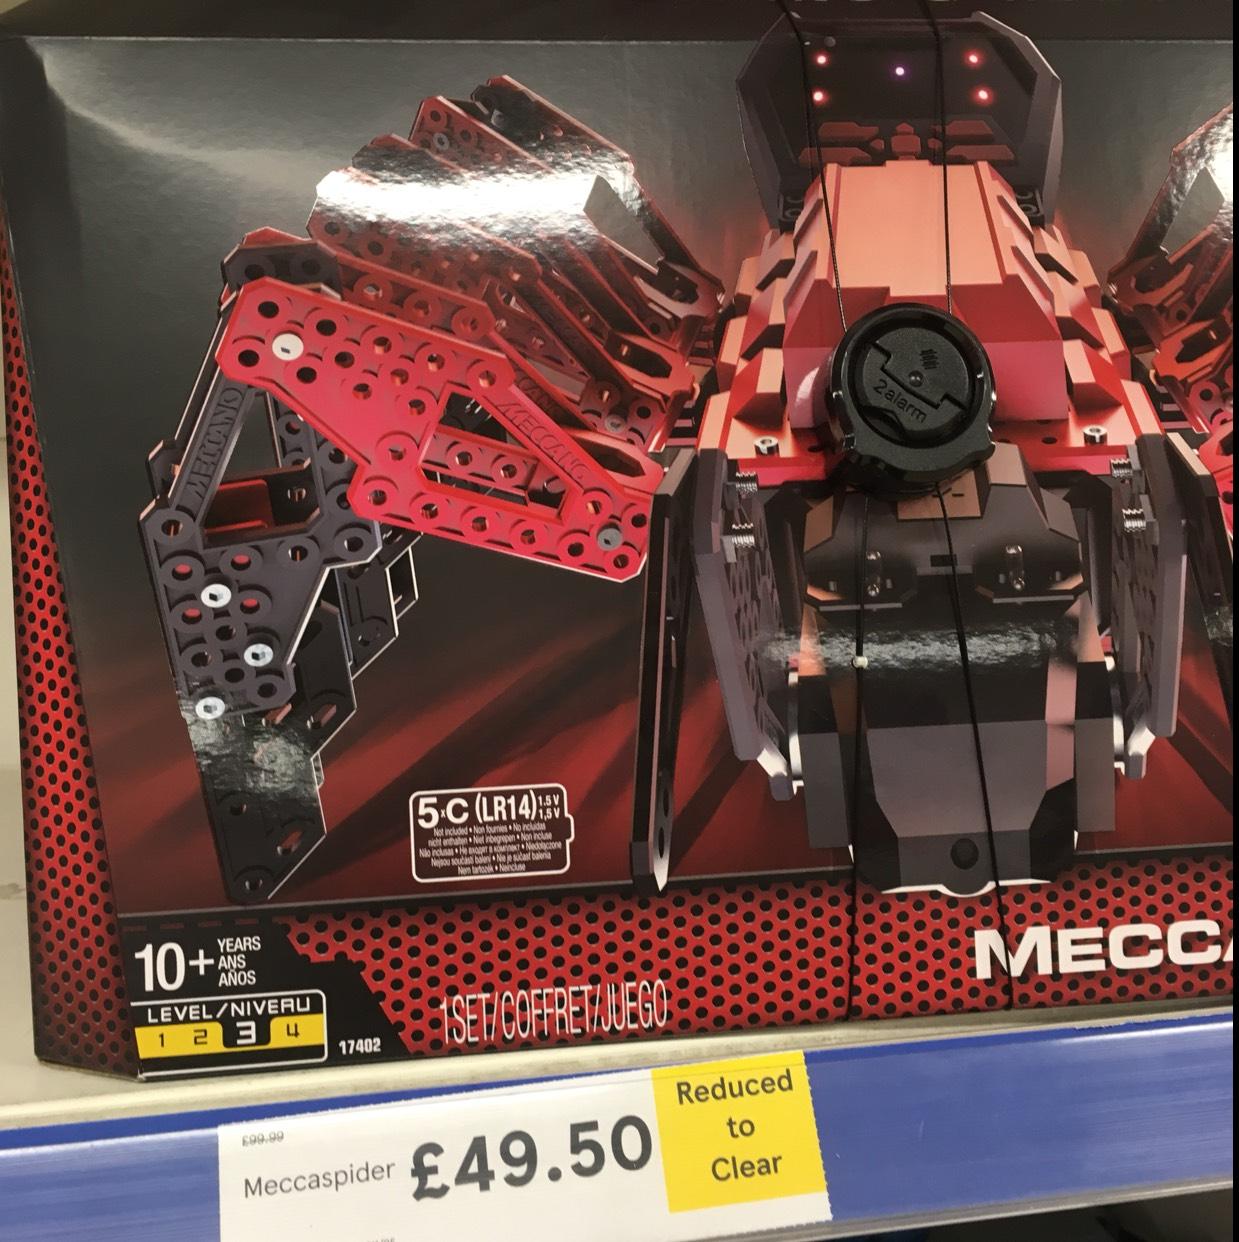 Meccano Meccaspider @ Tesco extra Seacroft Leeds - £49.50